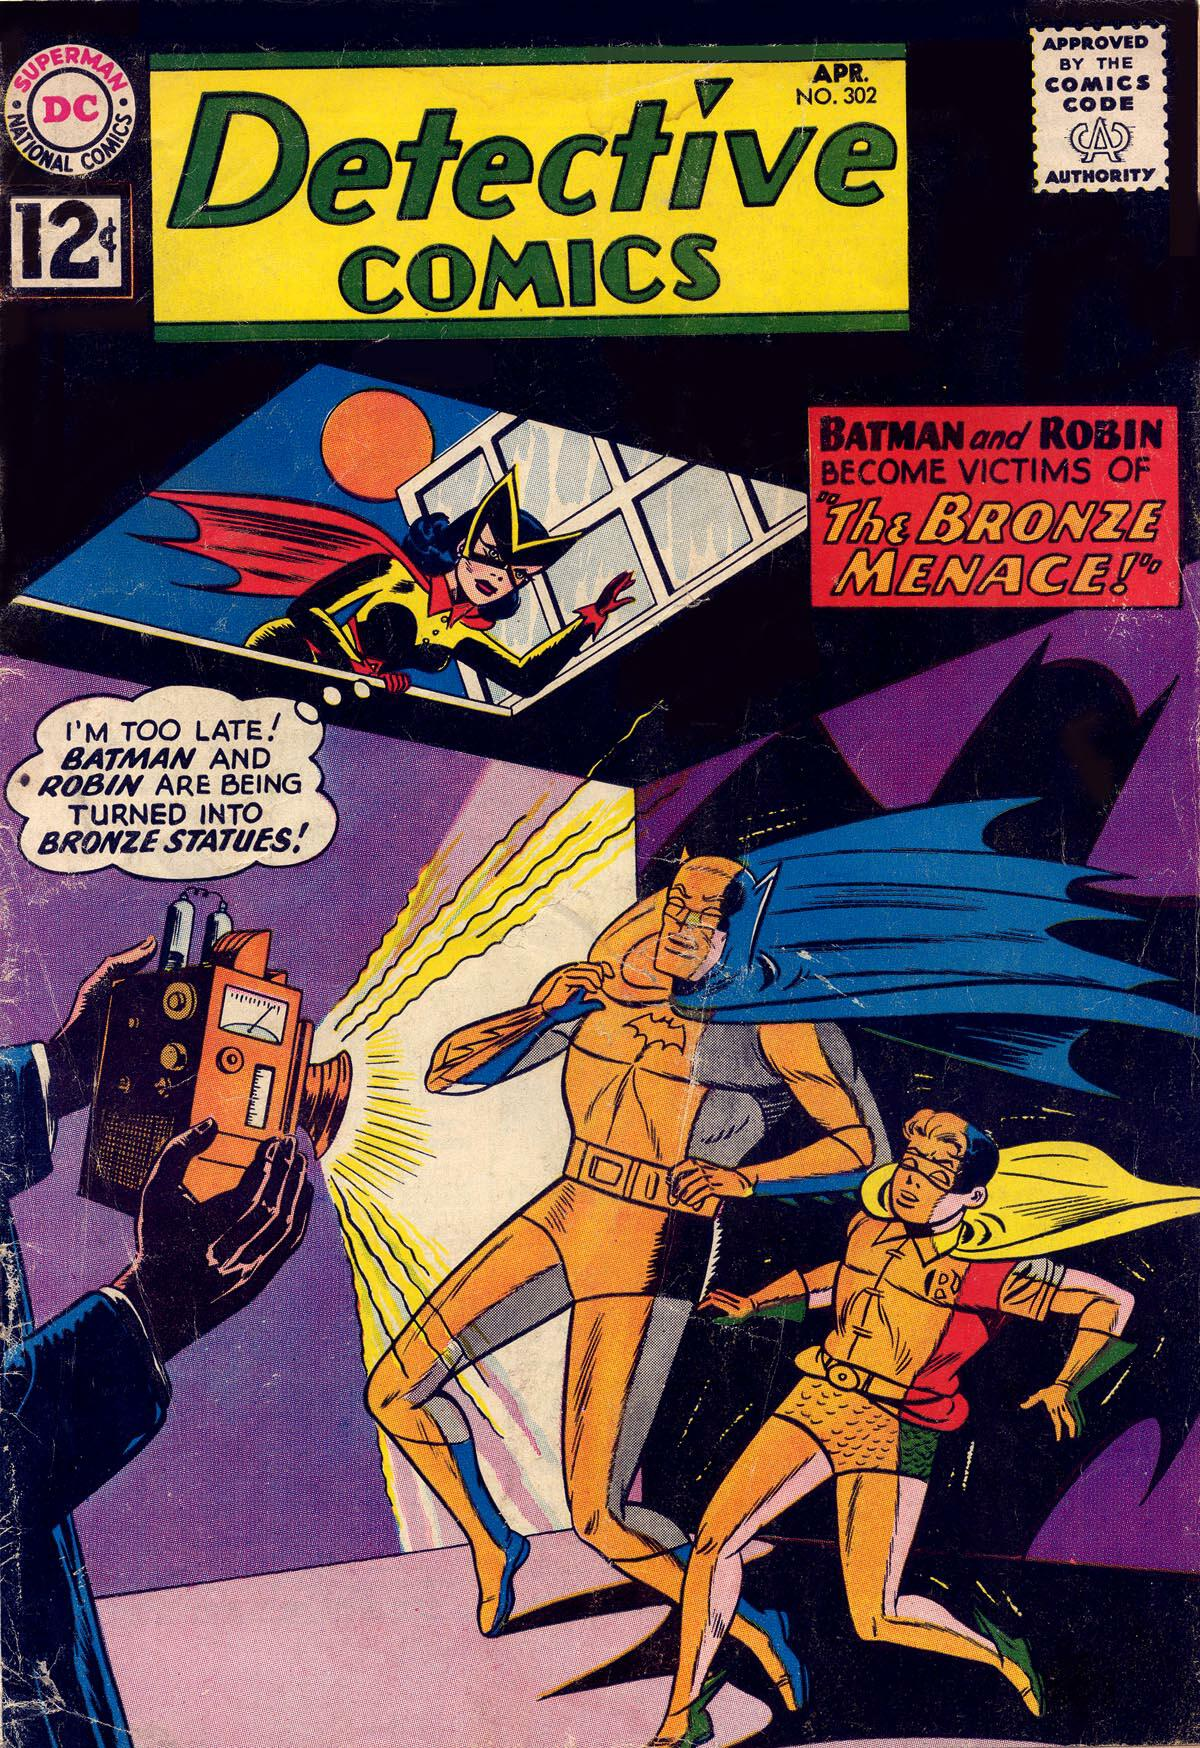 Detective Comics (1937) 302 Page 1